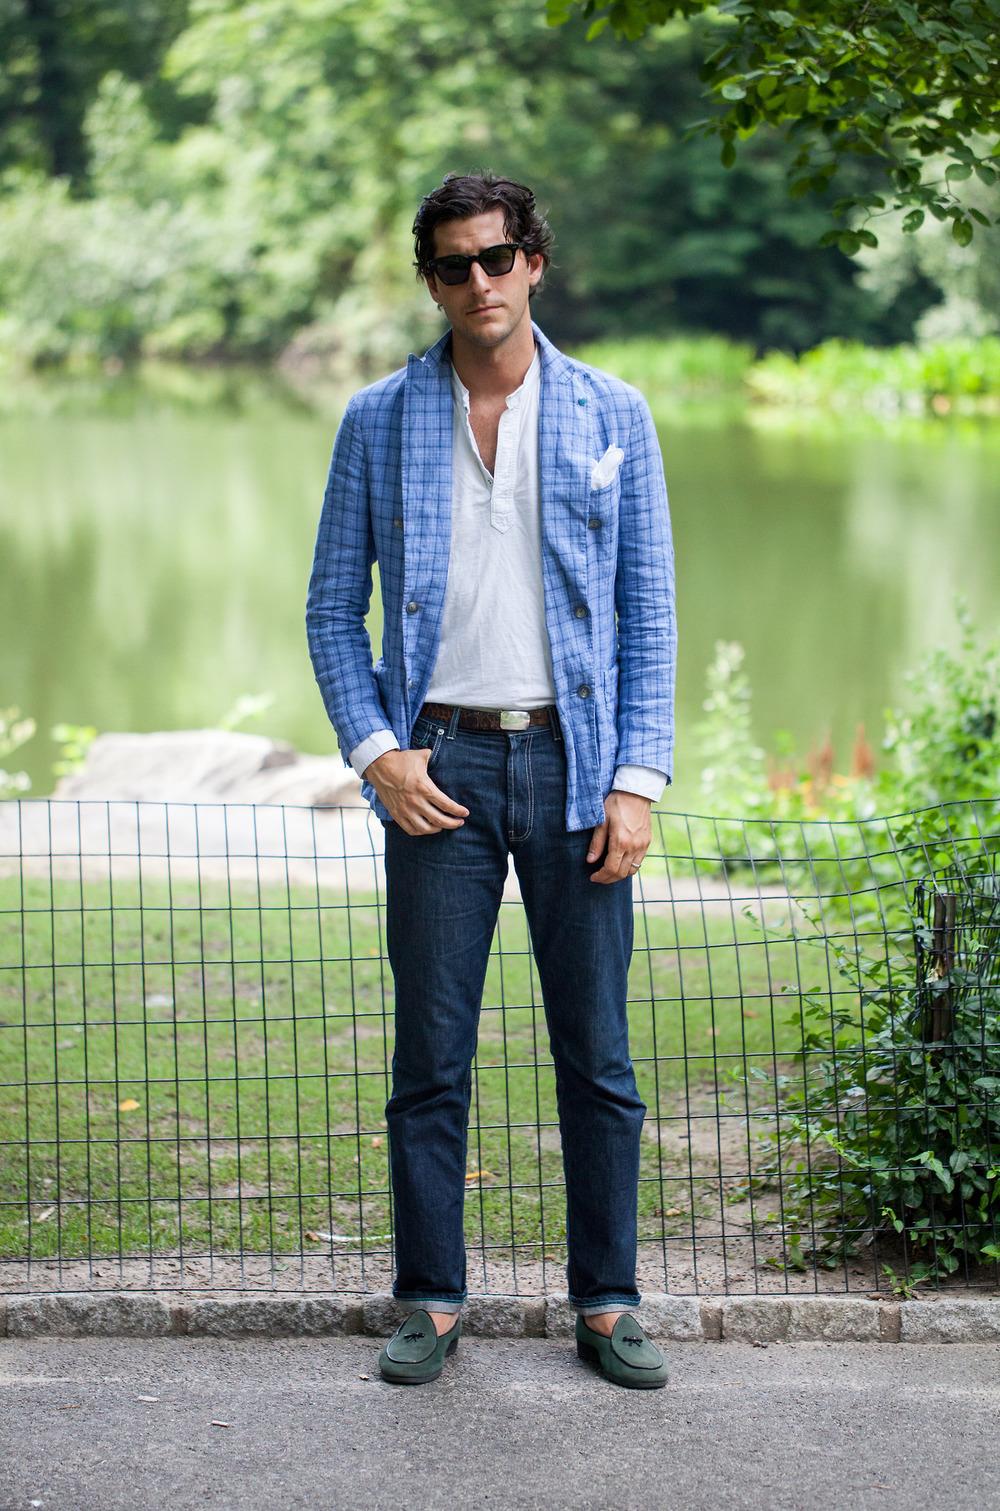 Antonio-Ciongoli-blue-blazer-dark-denim-lookbook-menswear.jpg